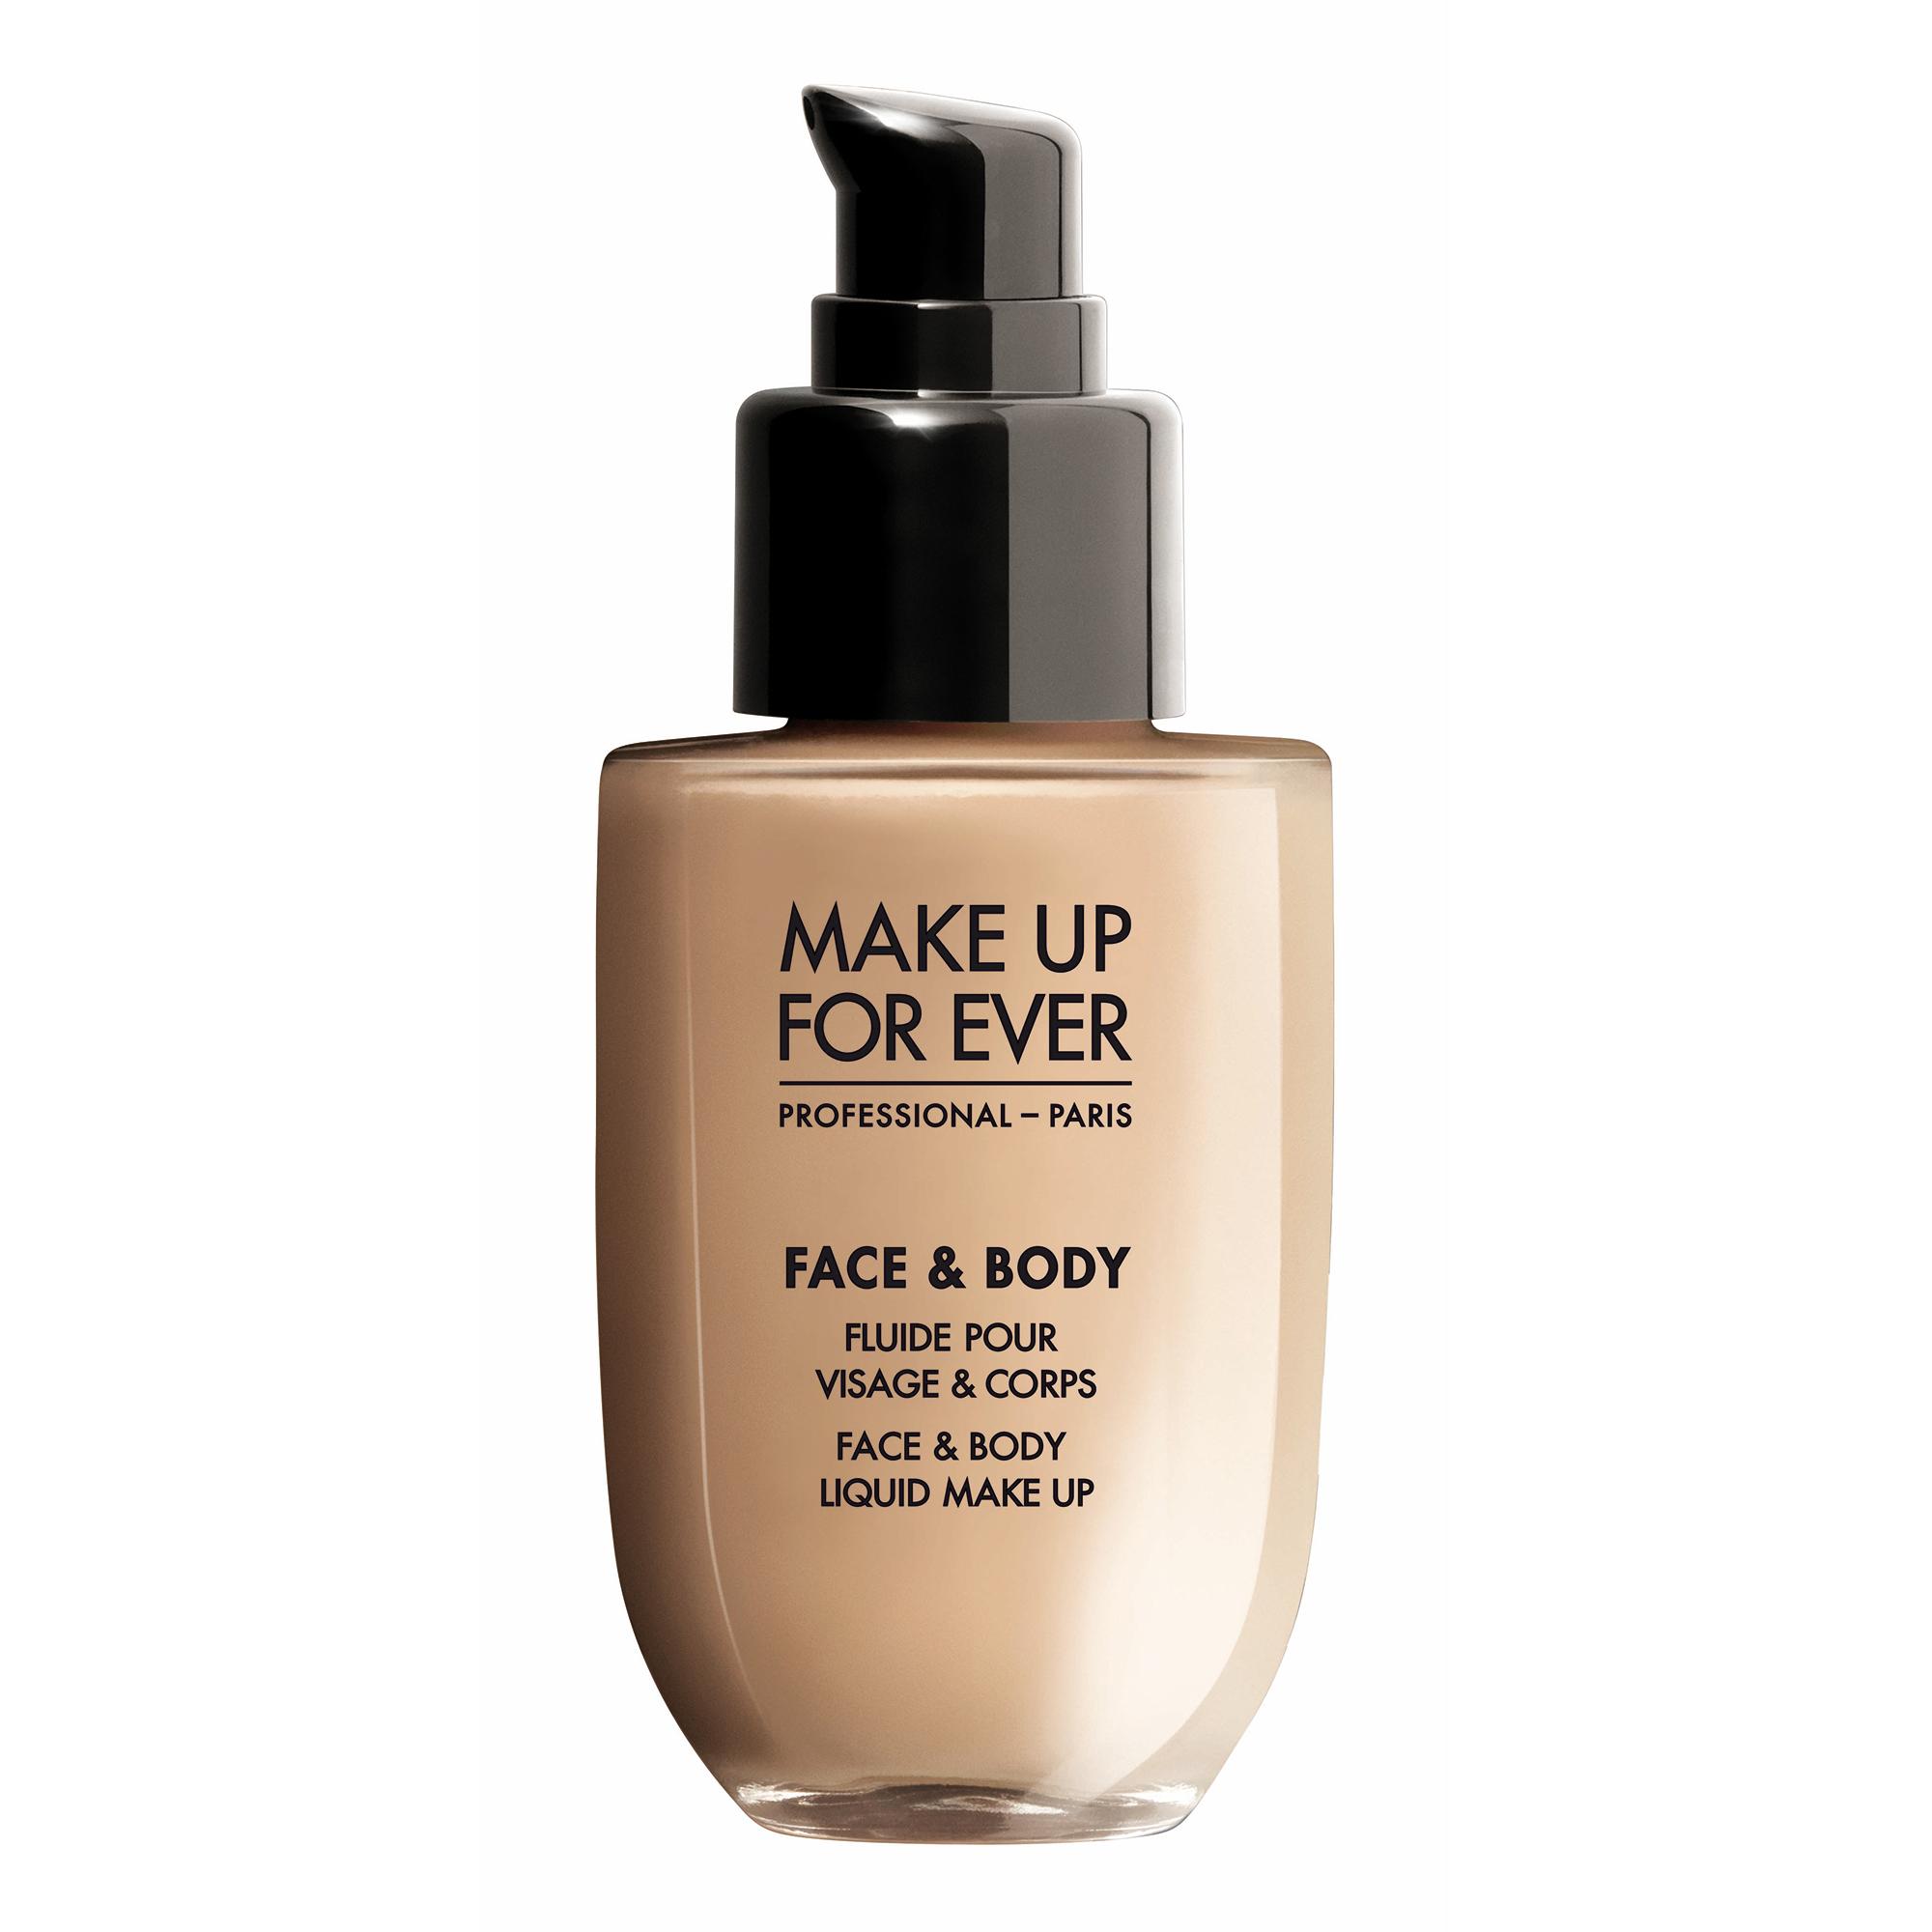 Make Up For Ever Face & Body Liquid Makeup, £27